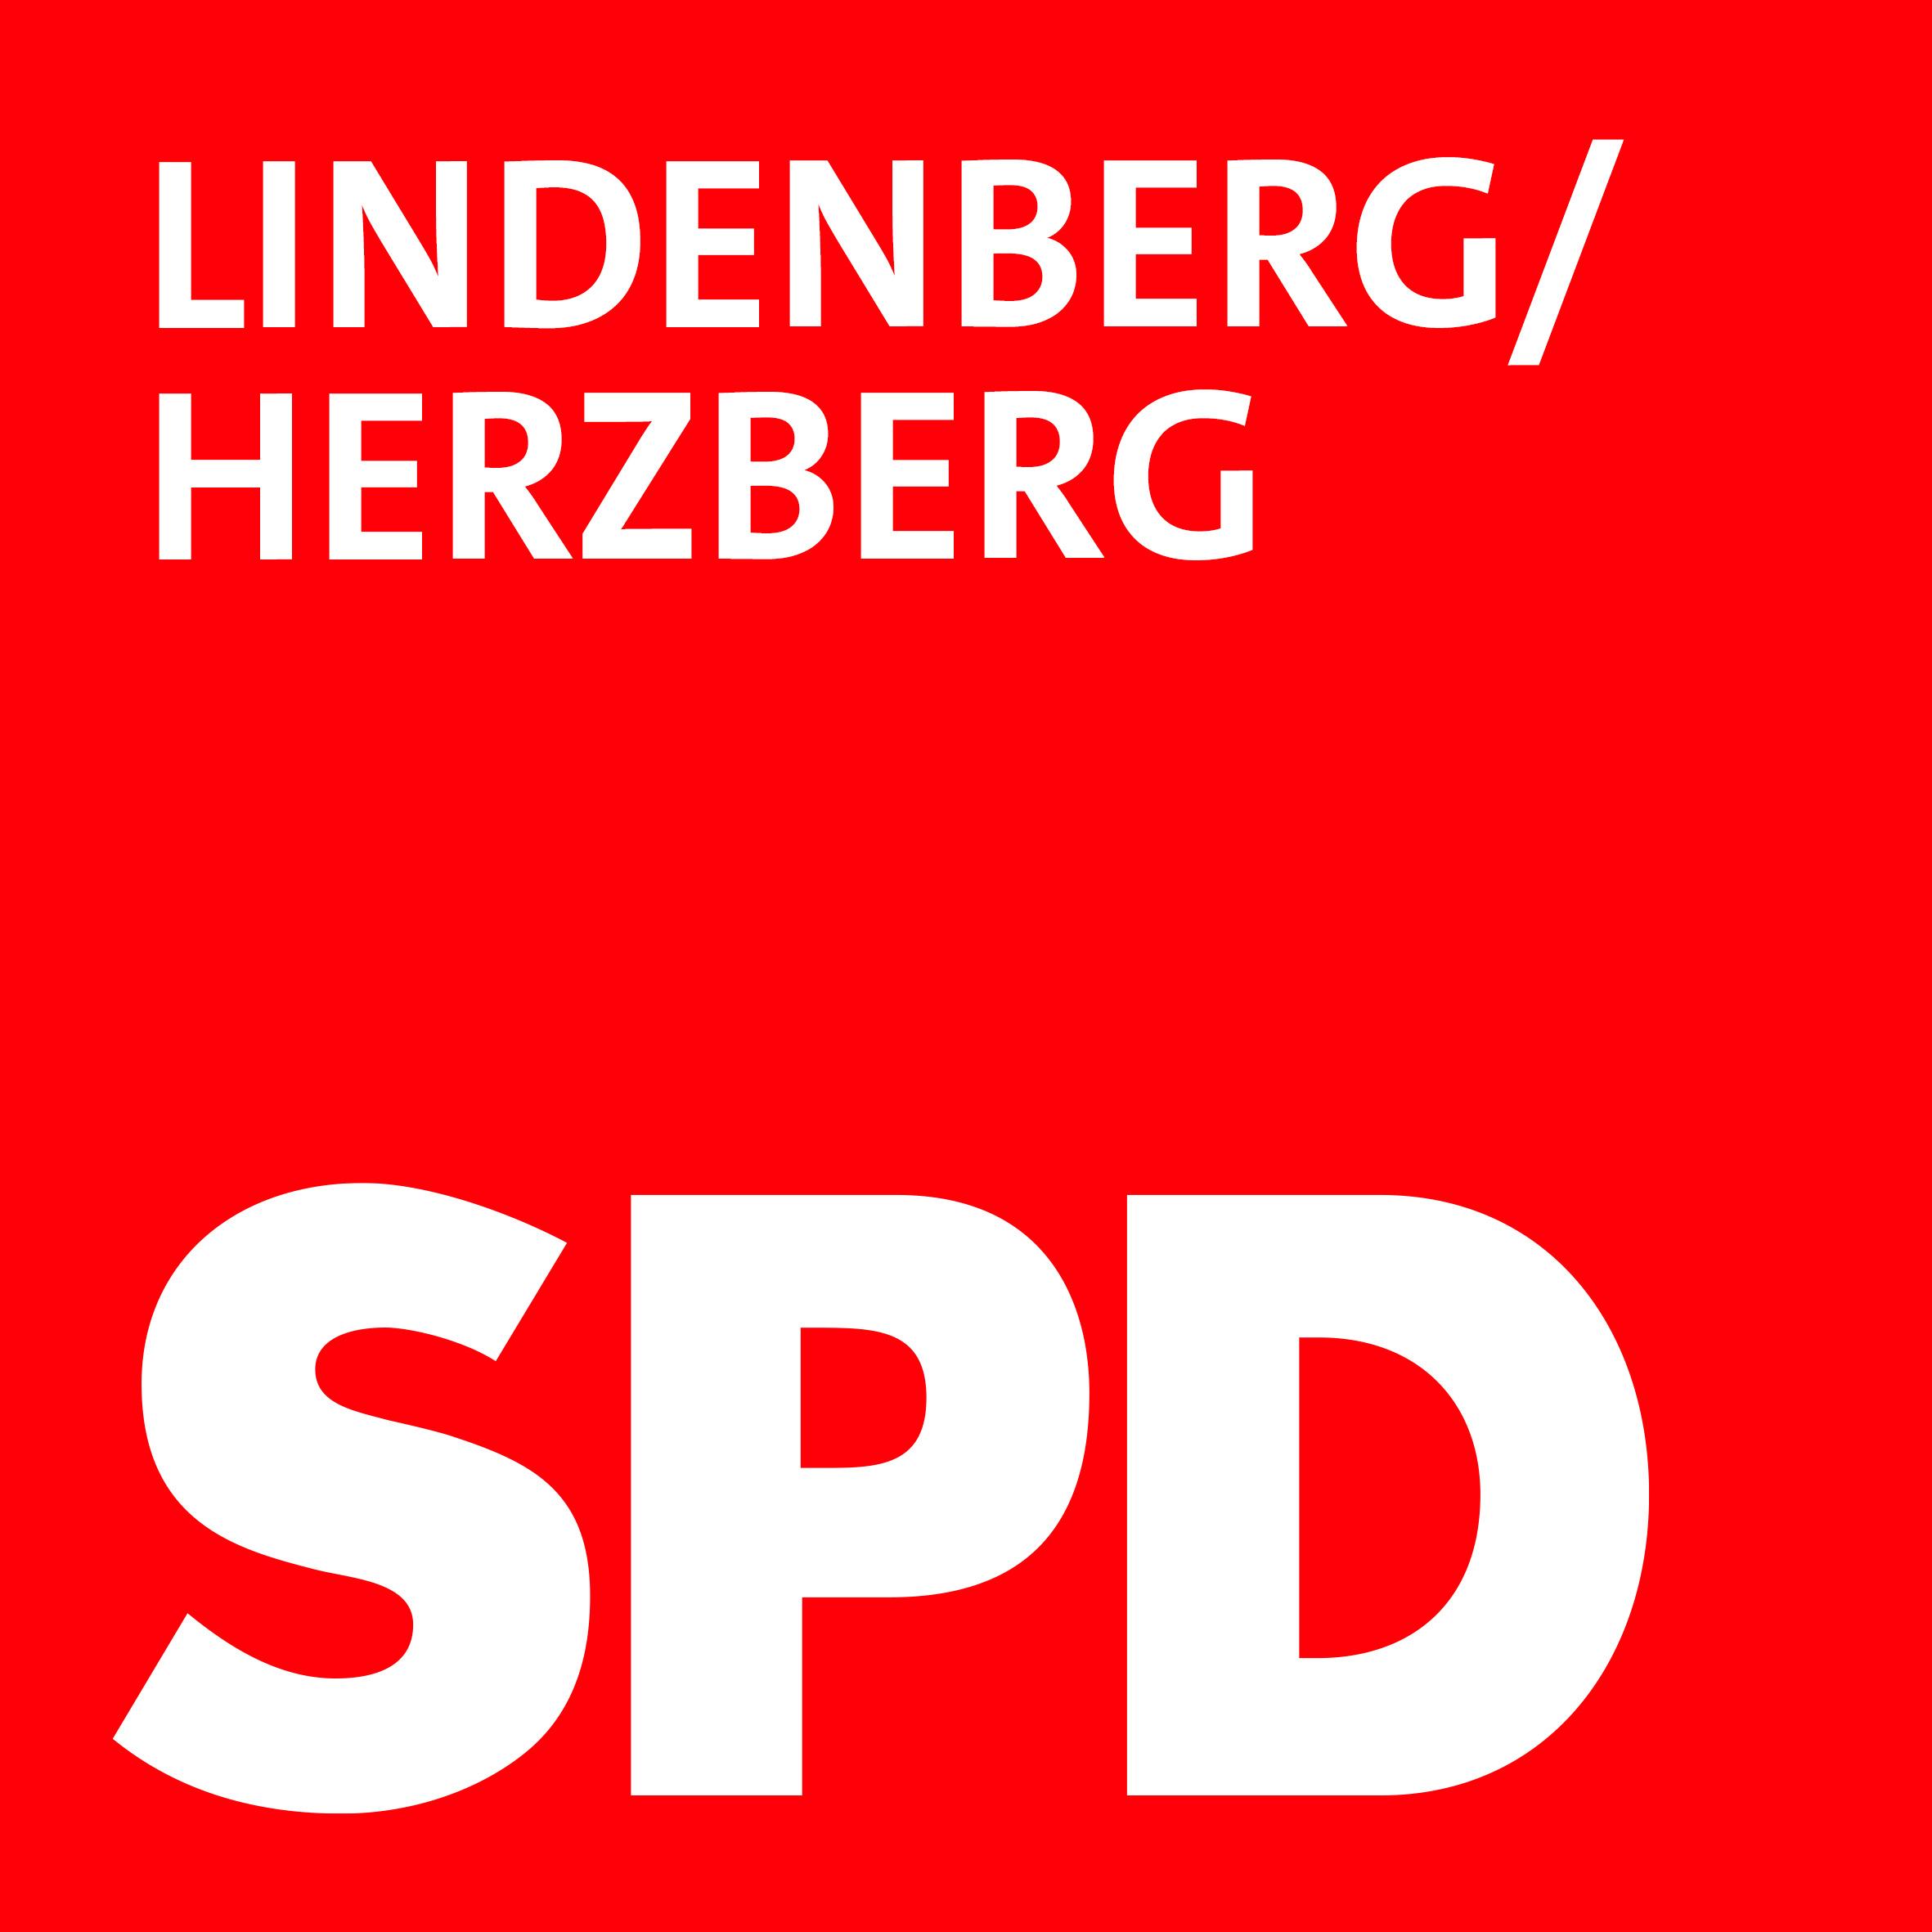 SPD Lindenberg/Herzberg